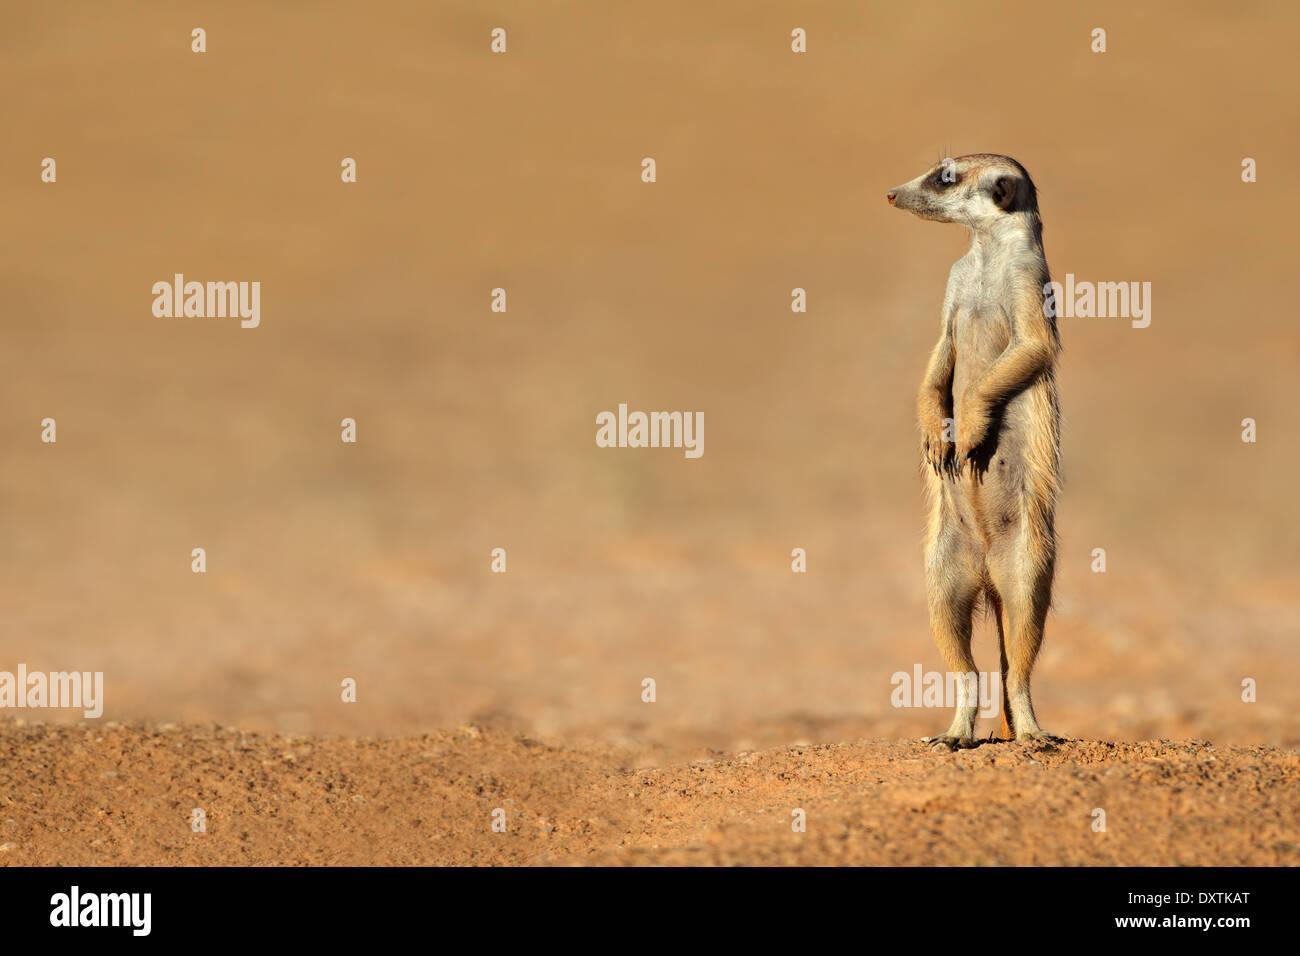 Alert meerkat (Suricata suricatta) standing on guard, Kalahari desert, South Africa - Stock Image